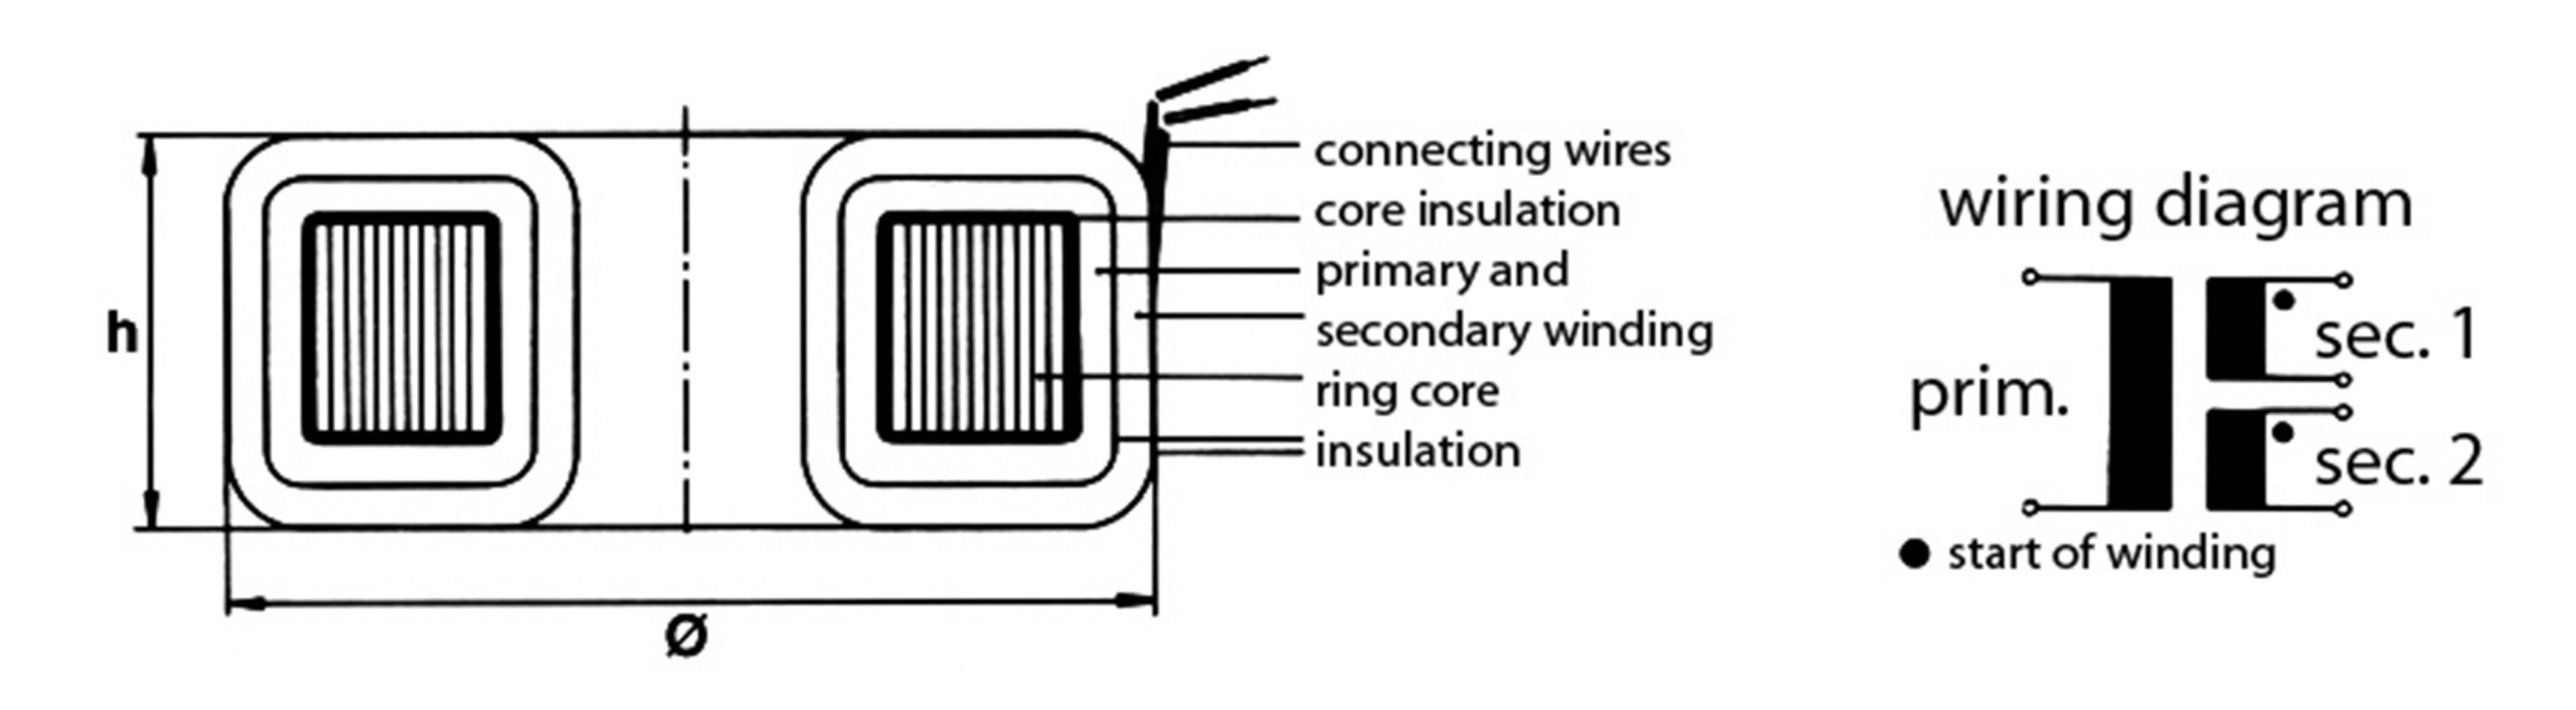 medium resolution of toroidal core transformer 1 x 230 v 2 x 12 30 va 1250 ma